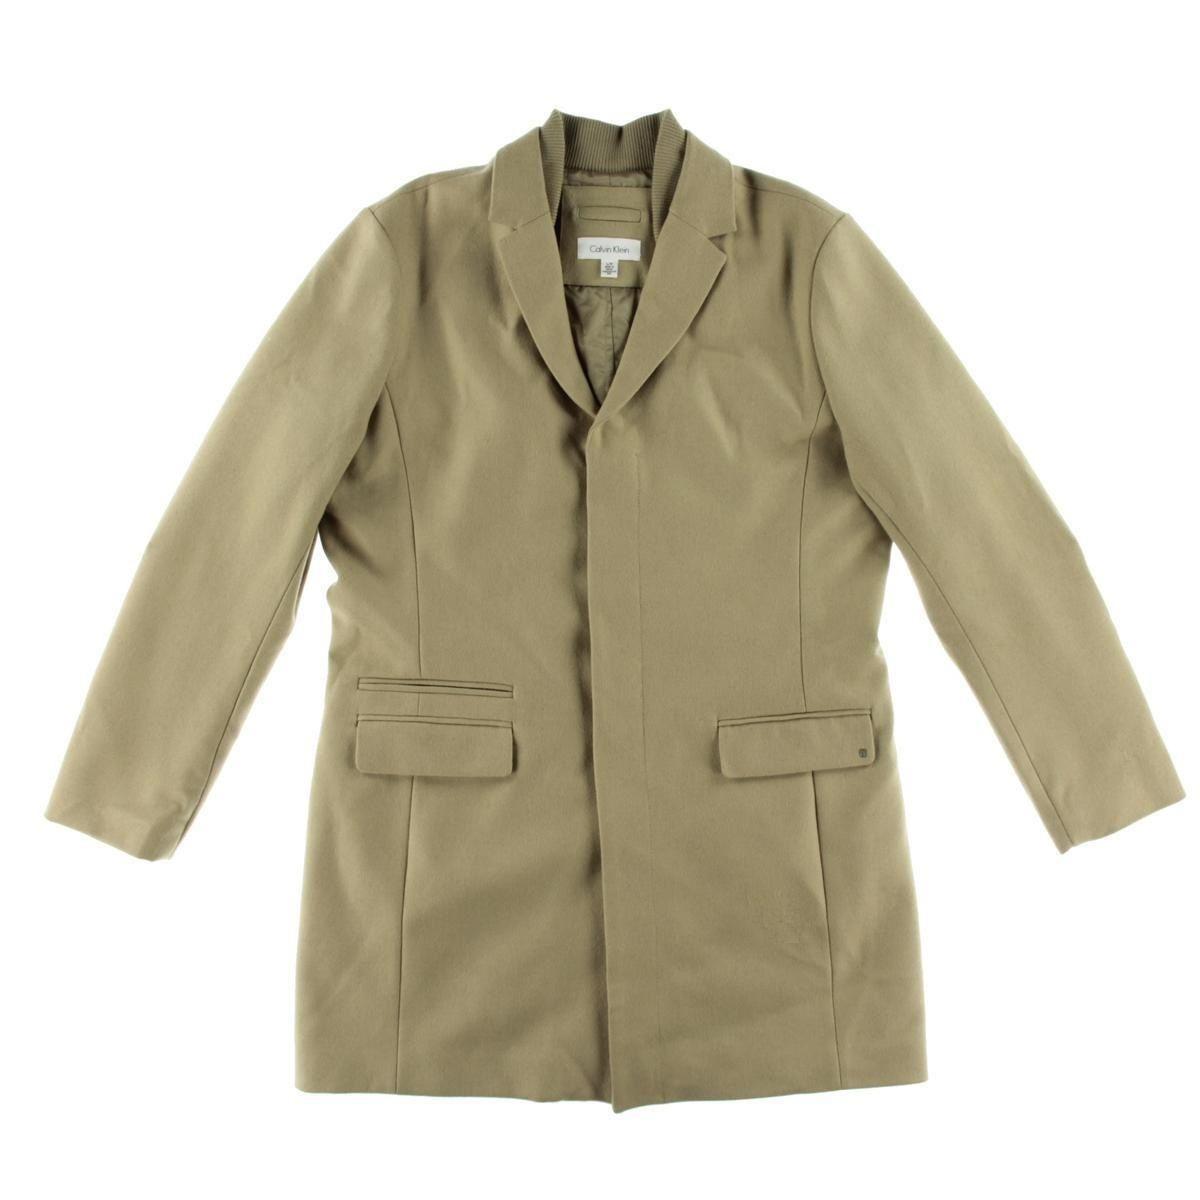 Calvin Klein Mens 248 Nwt Wool Blend Peacoat Coat Jacket L Large Tan Brown Jackets Coats Jackets Men S Coats Jackets [ 1200 x 1200 Pixel ]